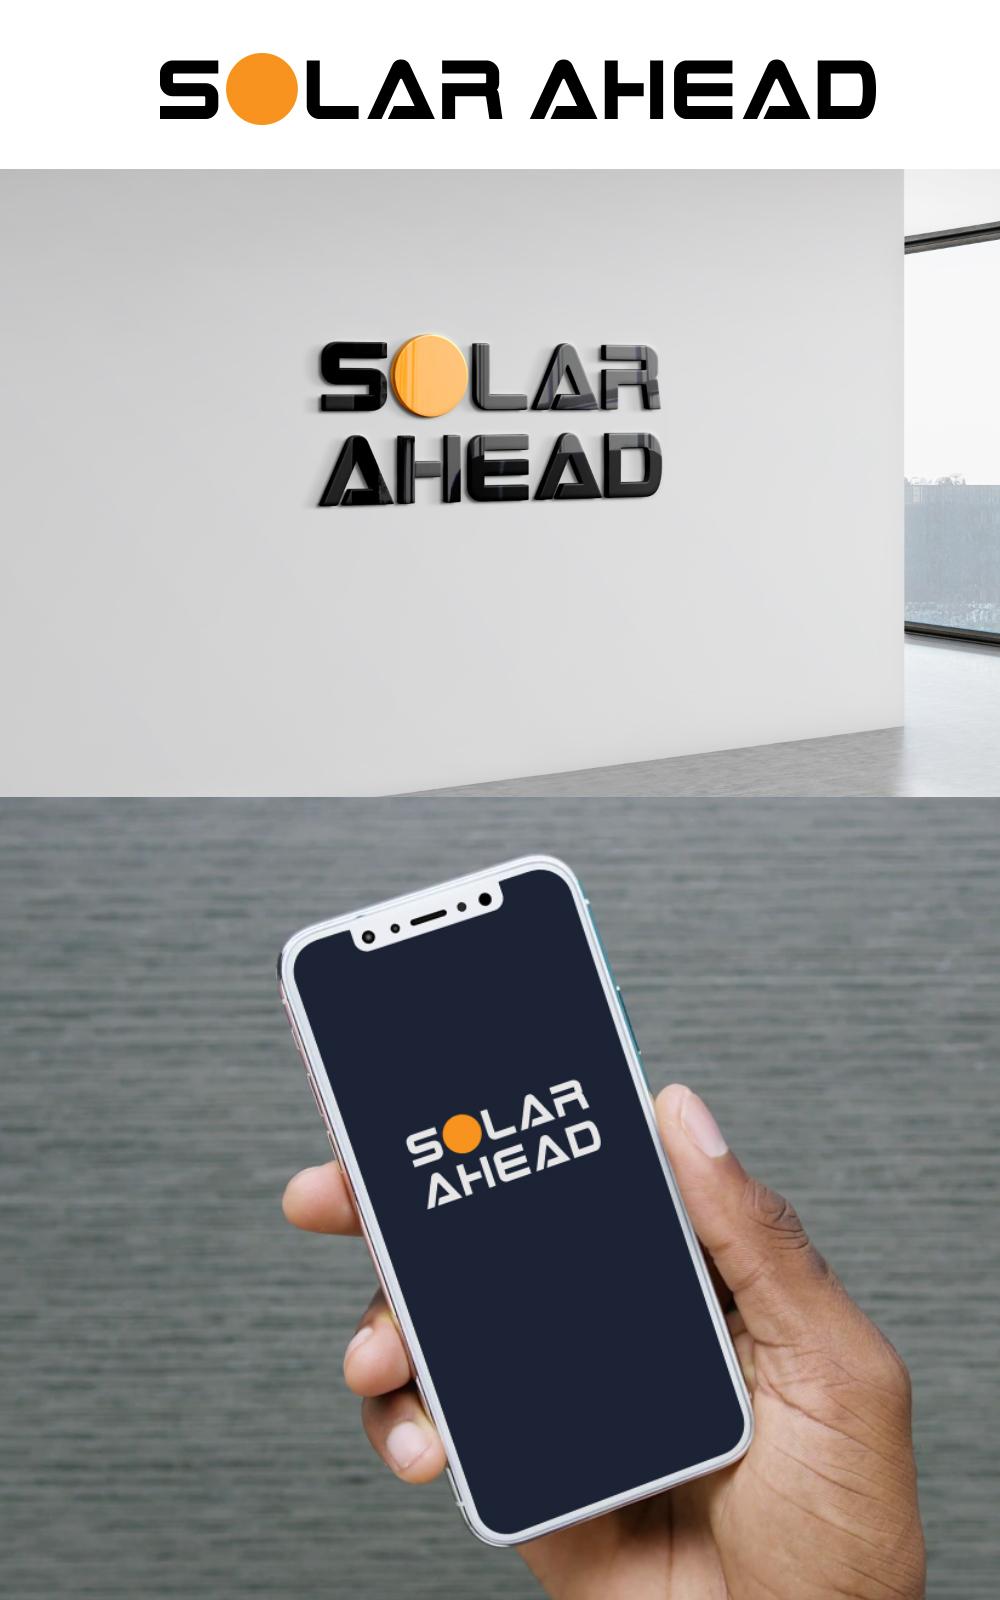 portfolio/085/150385/SOLAR_3.jpg